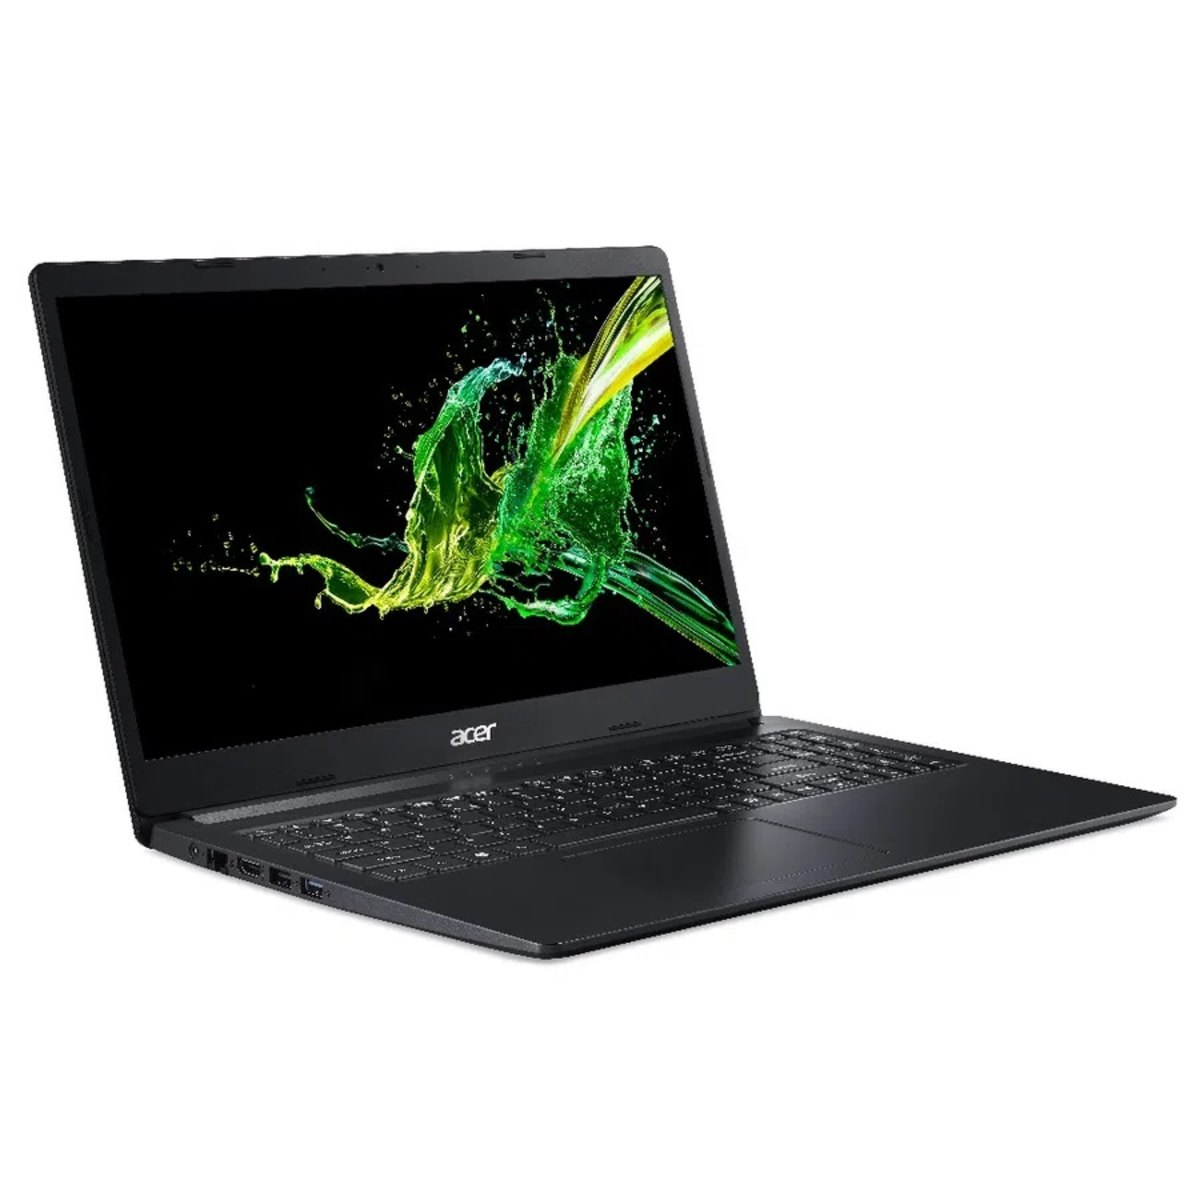 Notebook Acer A315 Intel Celeron N4000 Memoria 8gb Hd 1tb Tela 15.6' Hd Windows 10 Pro